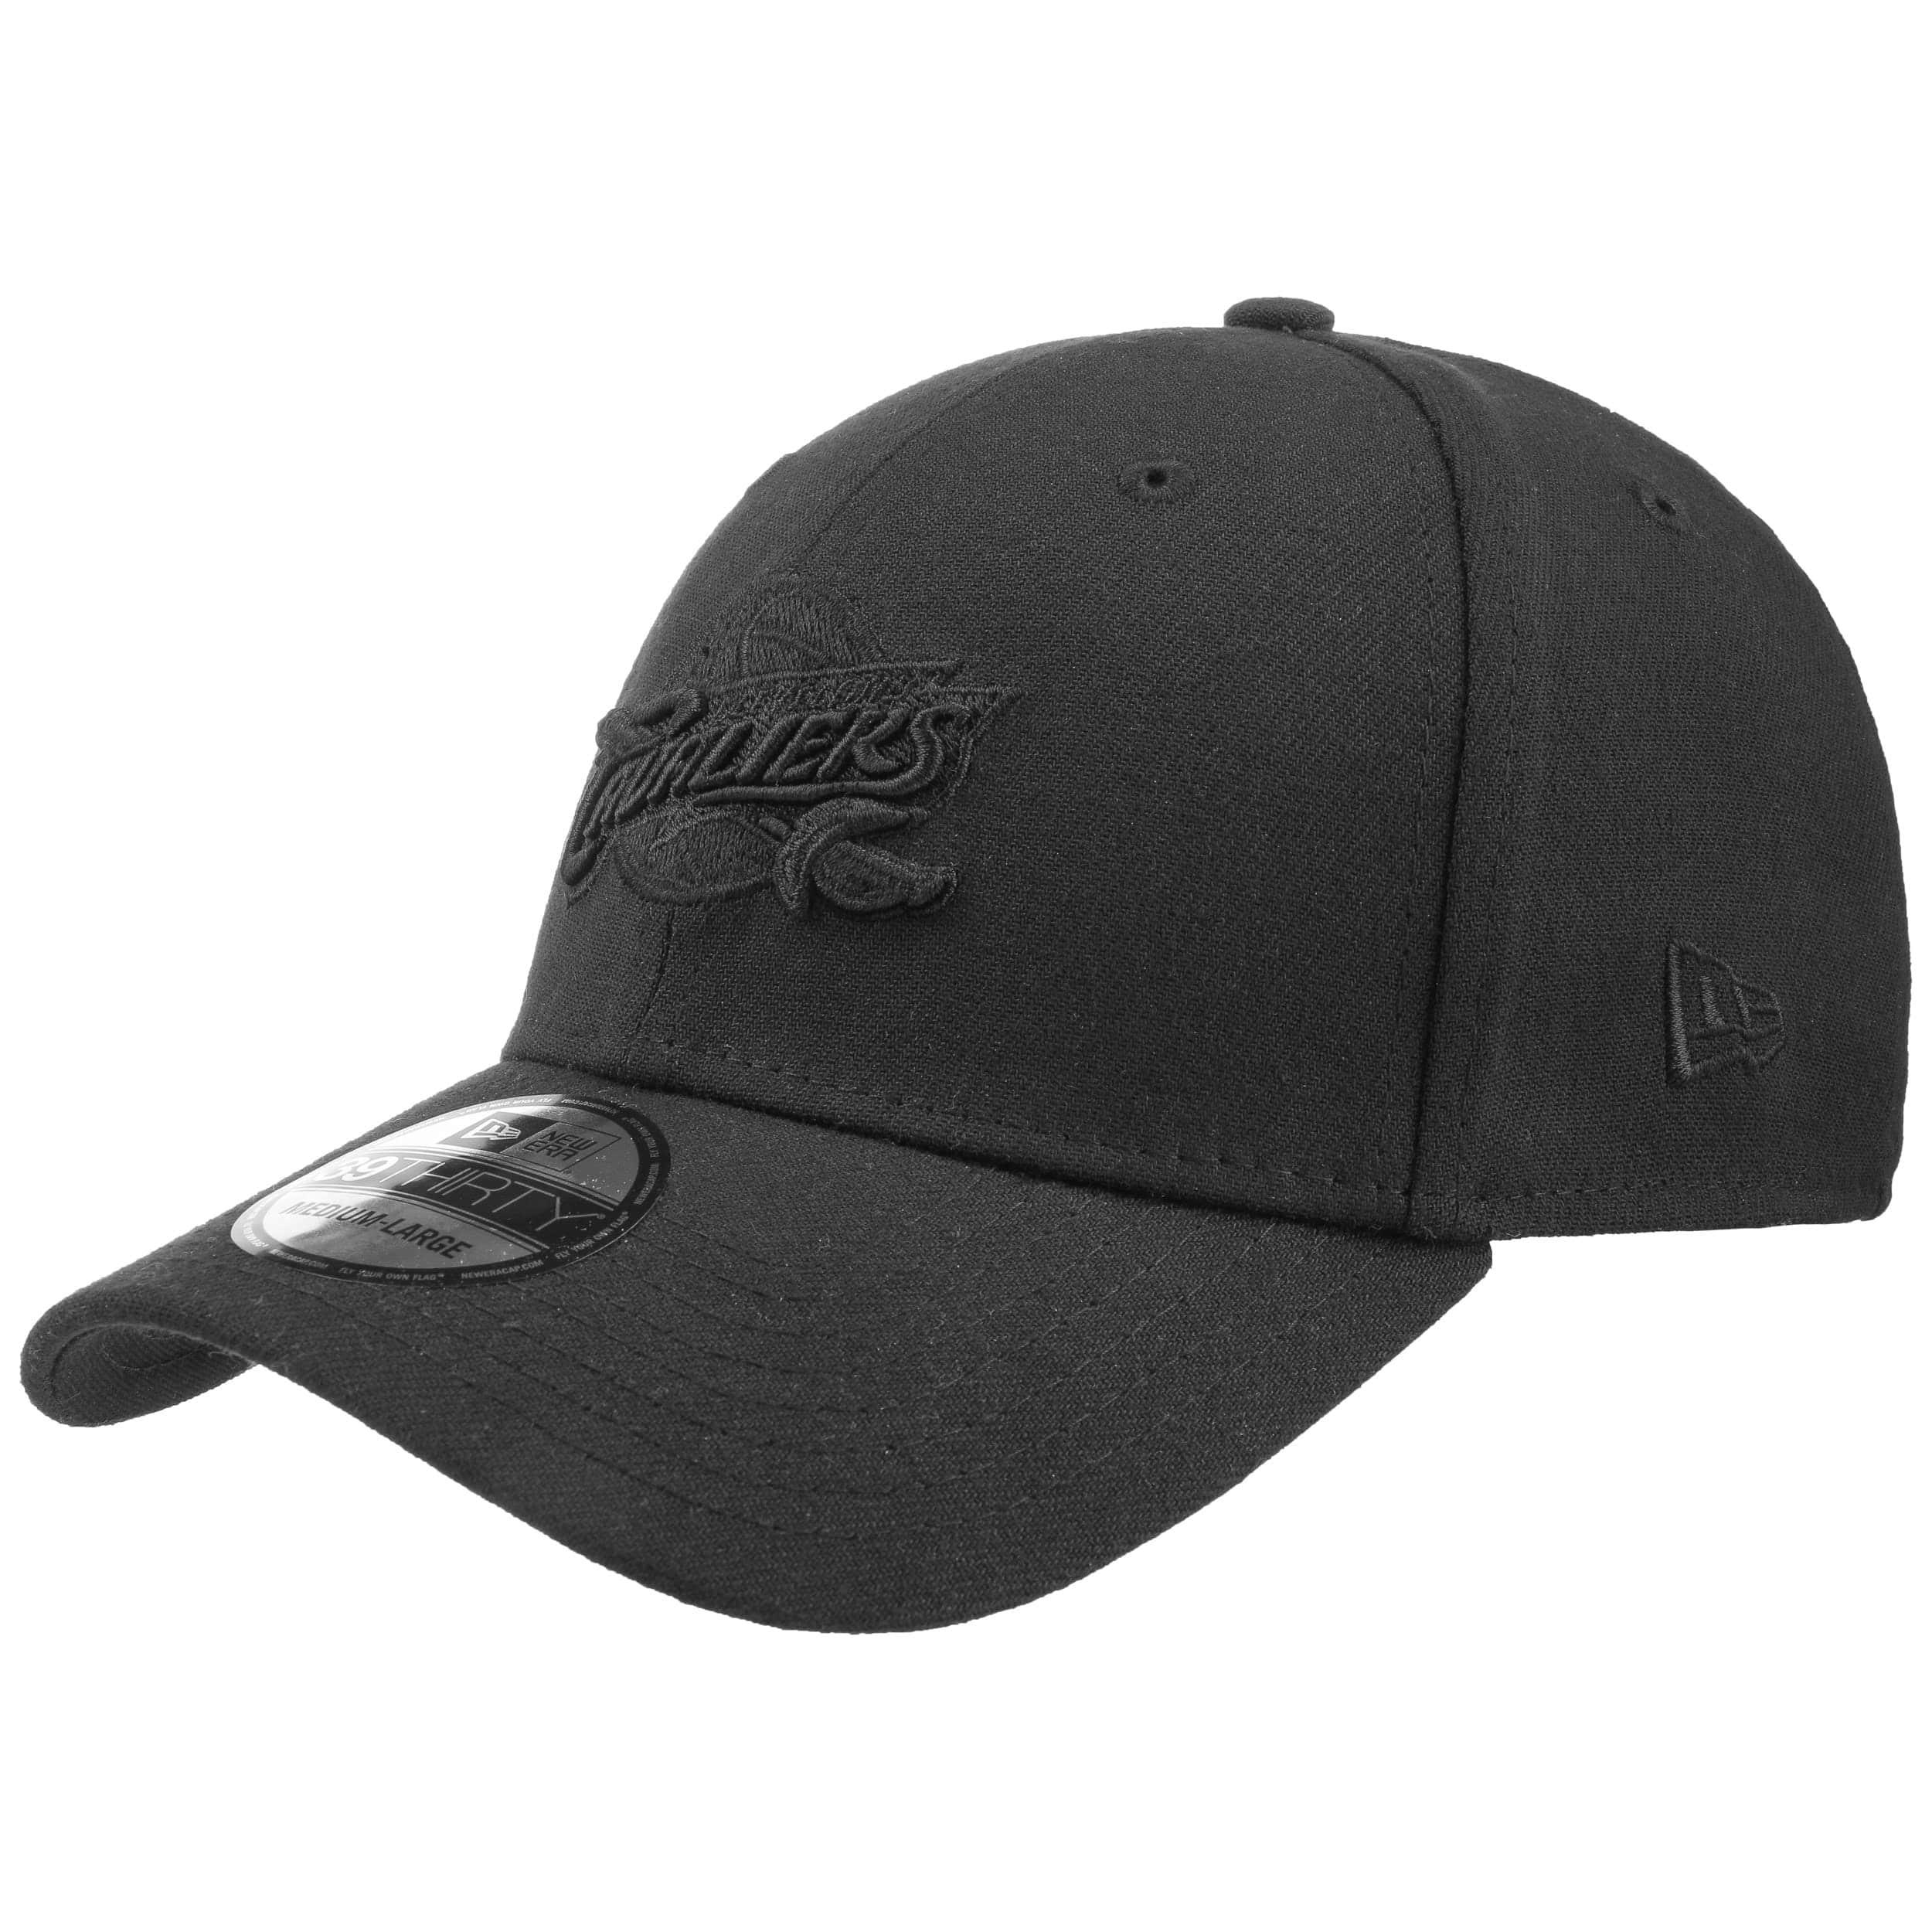 39thirty cleveland cavs bob cap by new era eur 24 95 hats caps beanies shop online. Black Bedroom Furniture Sets. Home Design Ideas